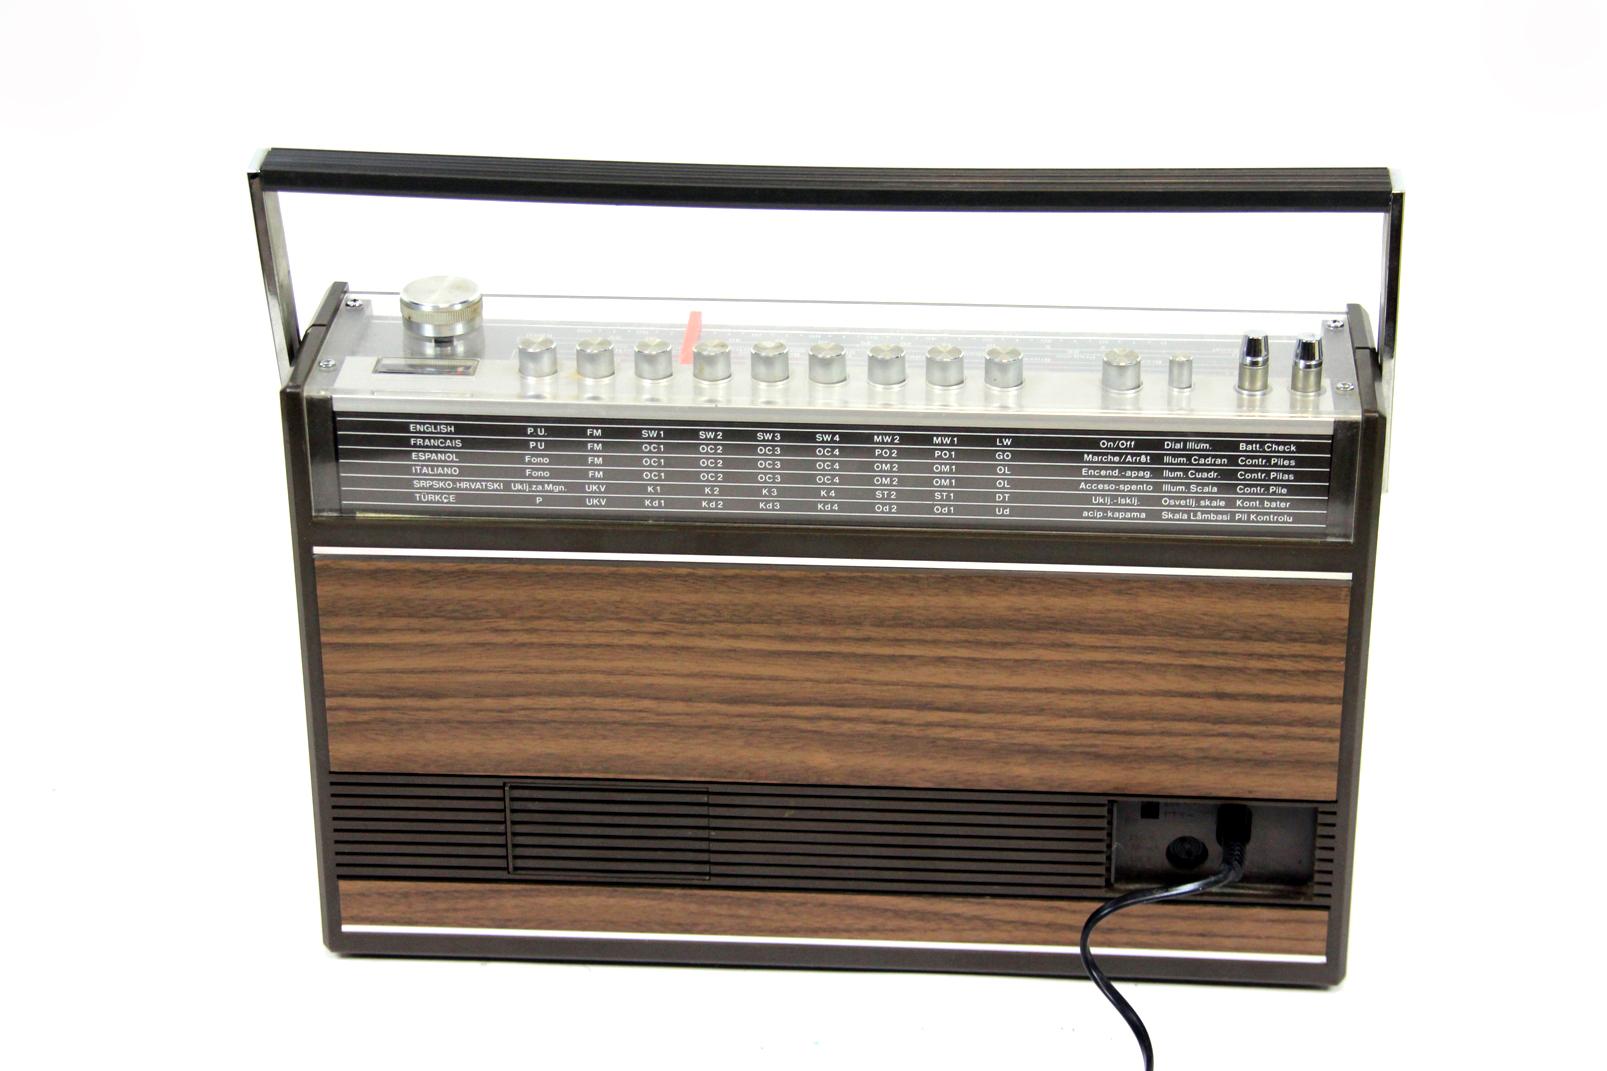 saba transall de luxe automatic g transistorradio. Black Bedroom Furniture Sets. Home Design Ideas